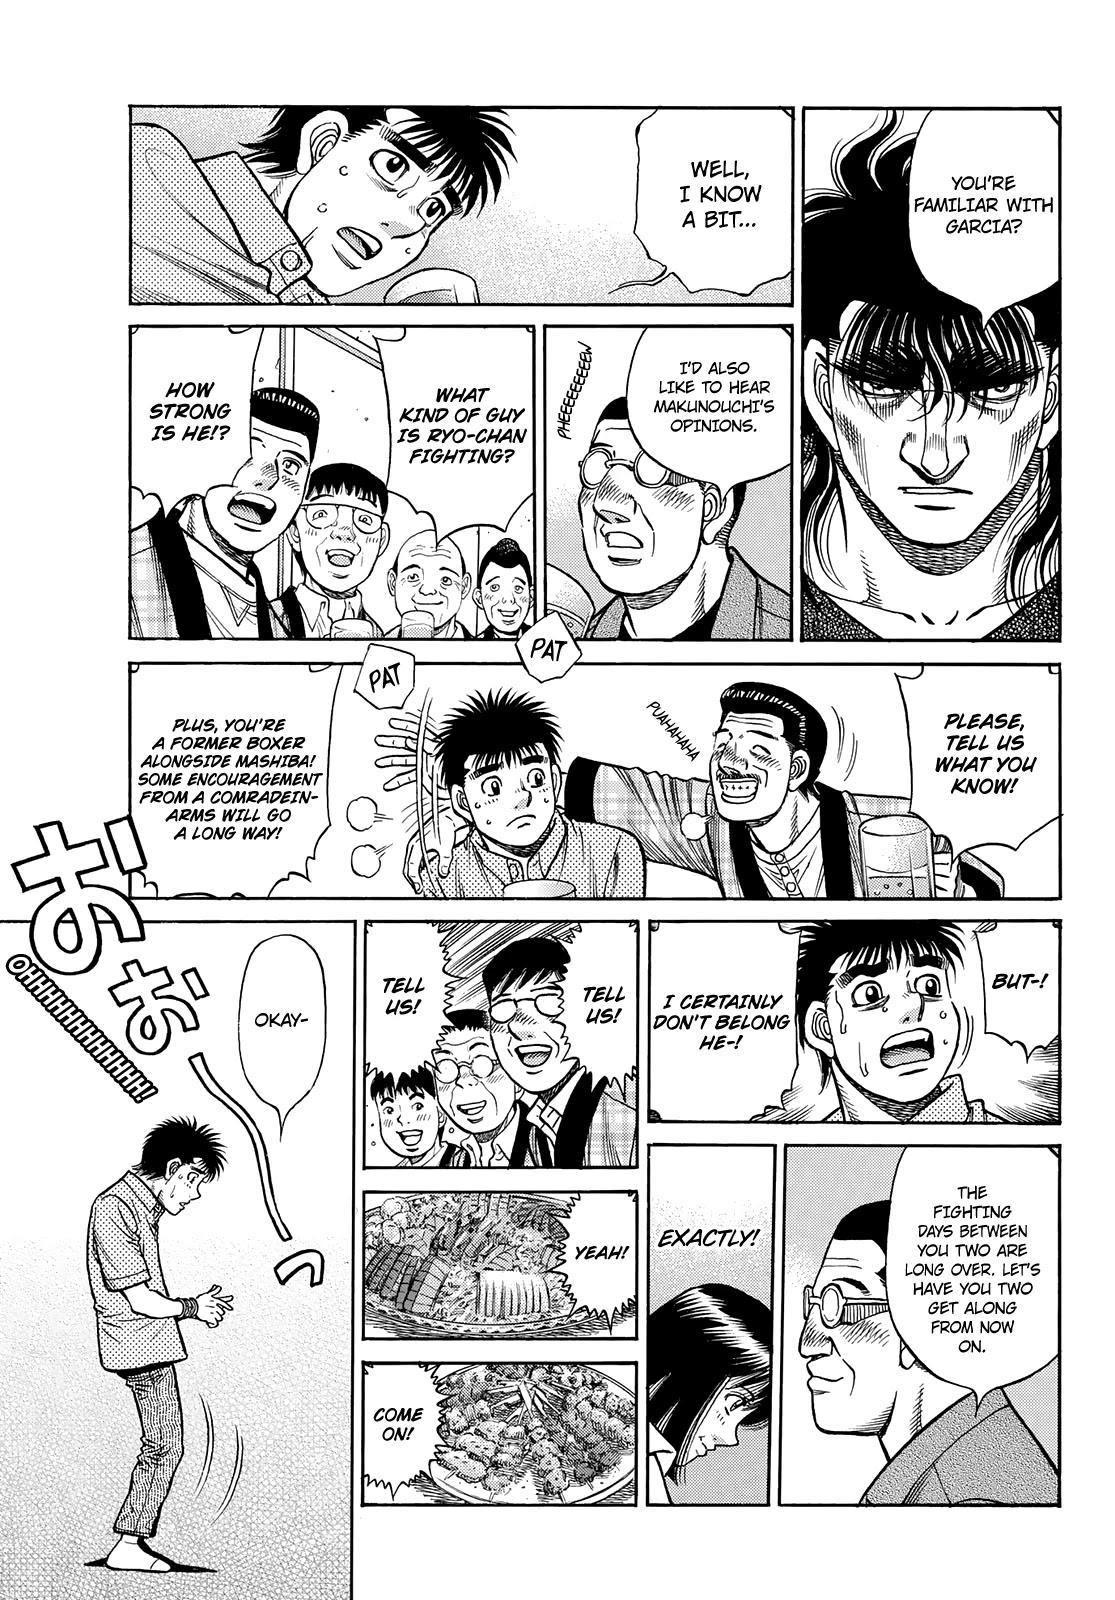 Hajime No Ippo Chapter 1352: Encouragement Party page 5 - Mangakakalot